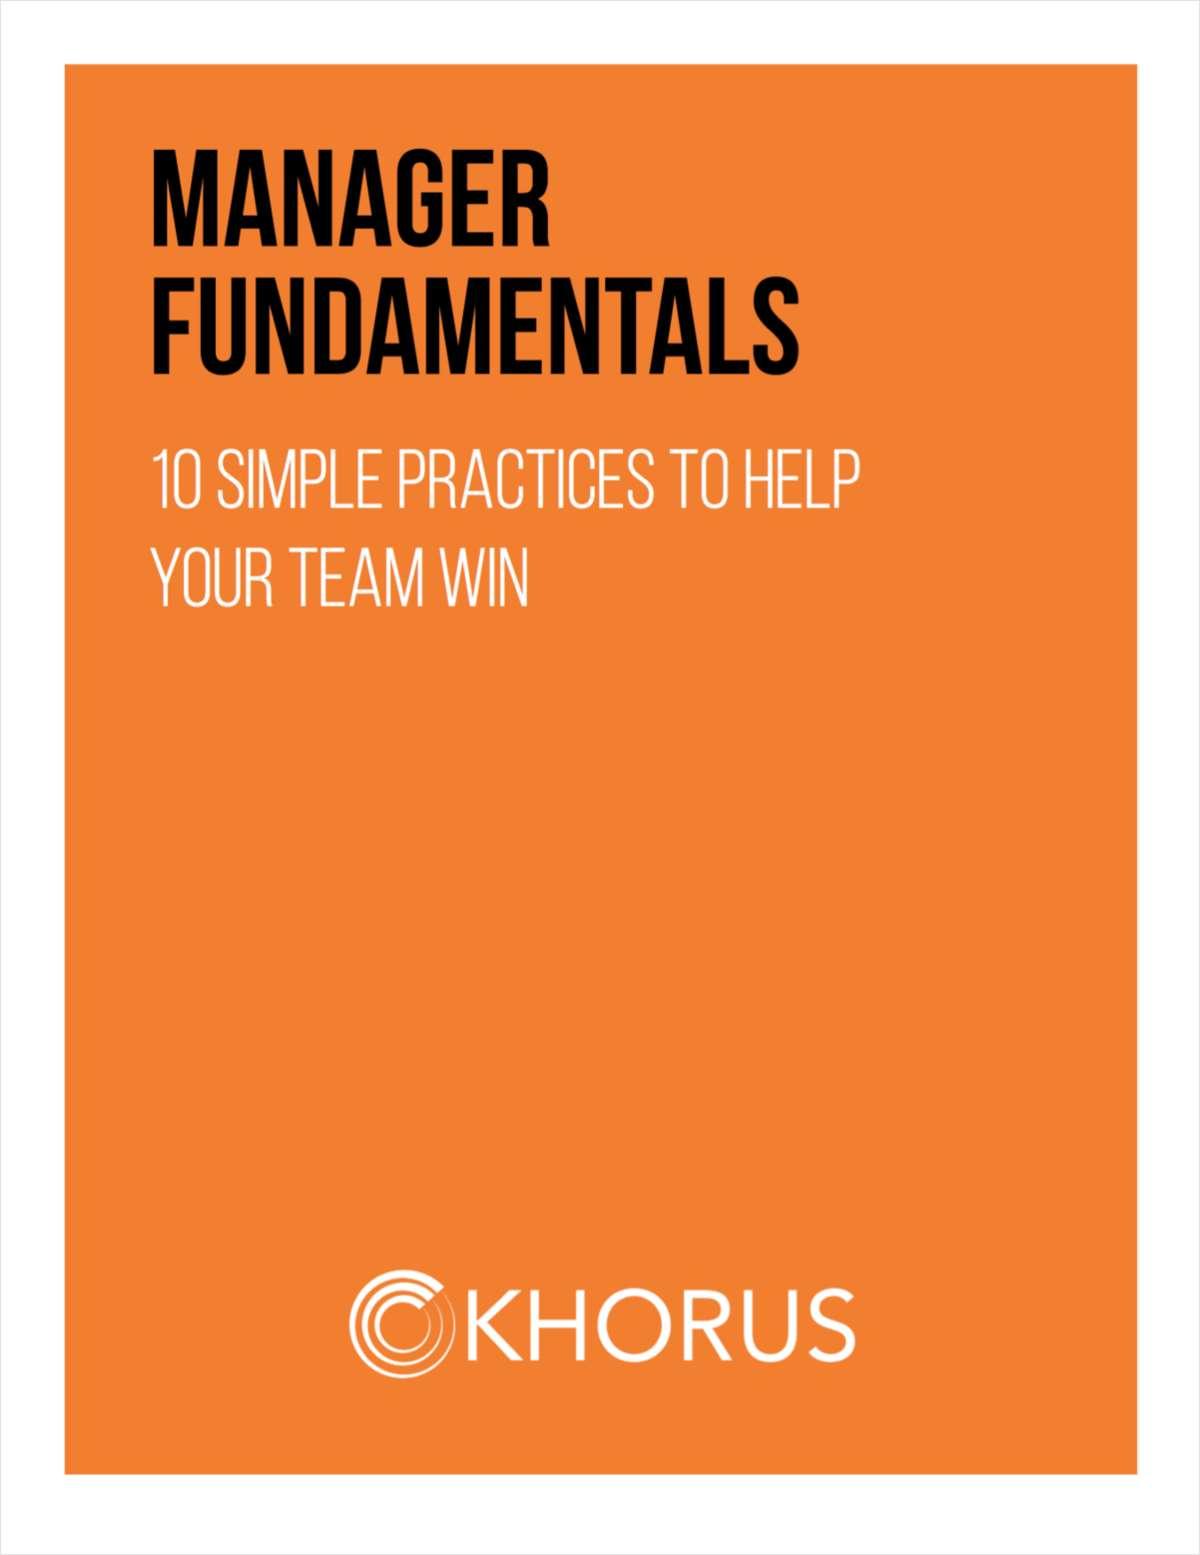 Manager Fundamentals